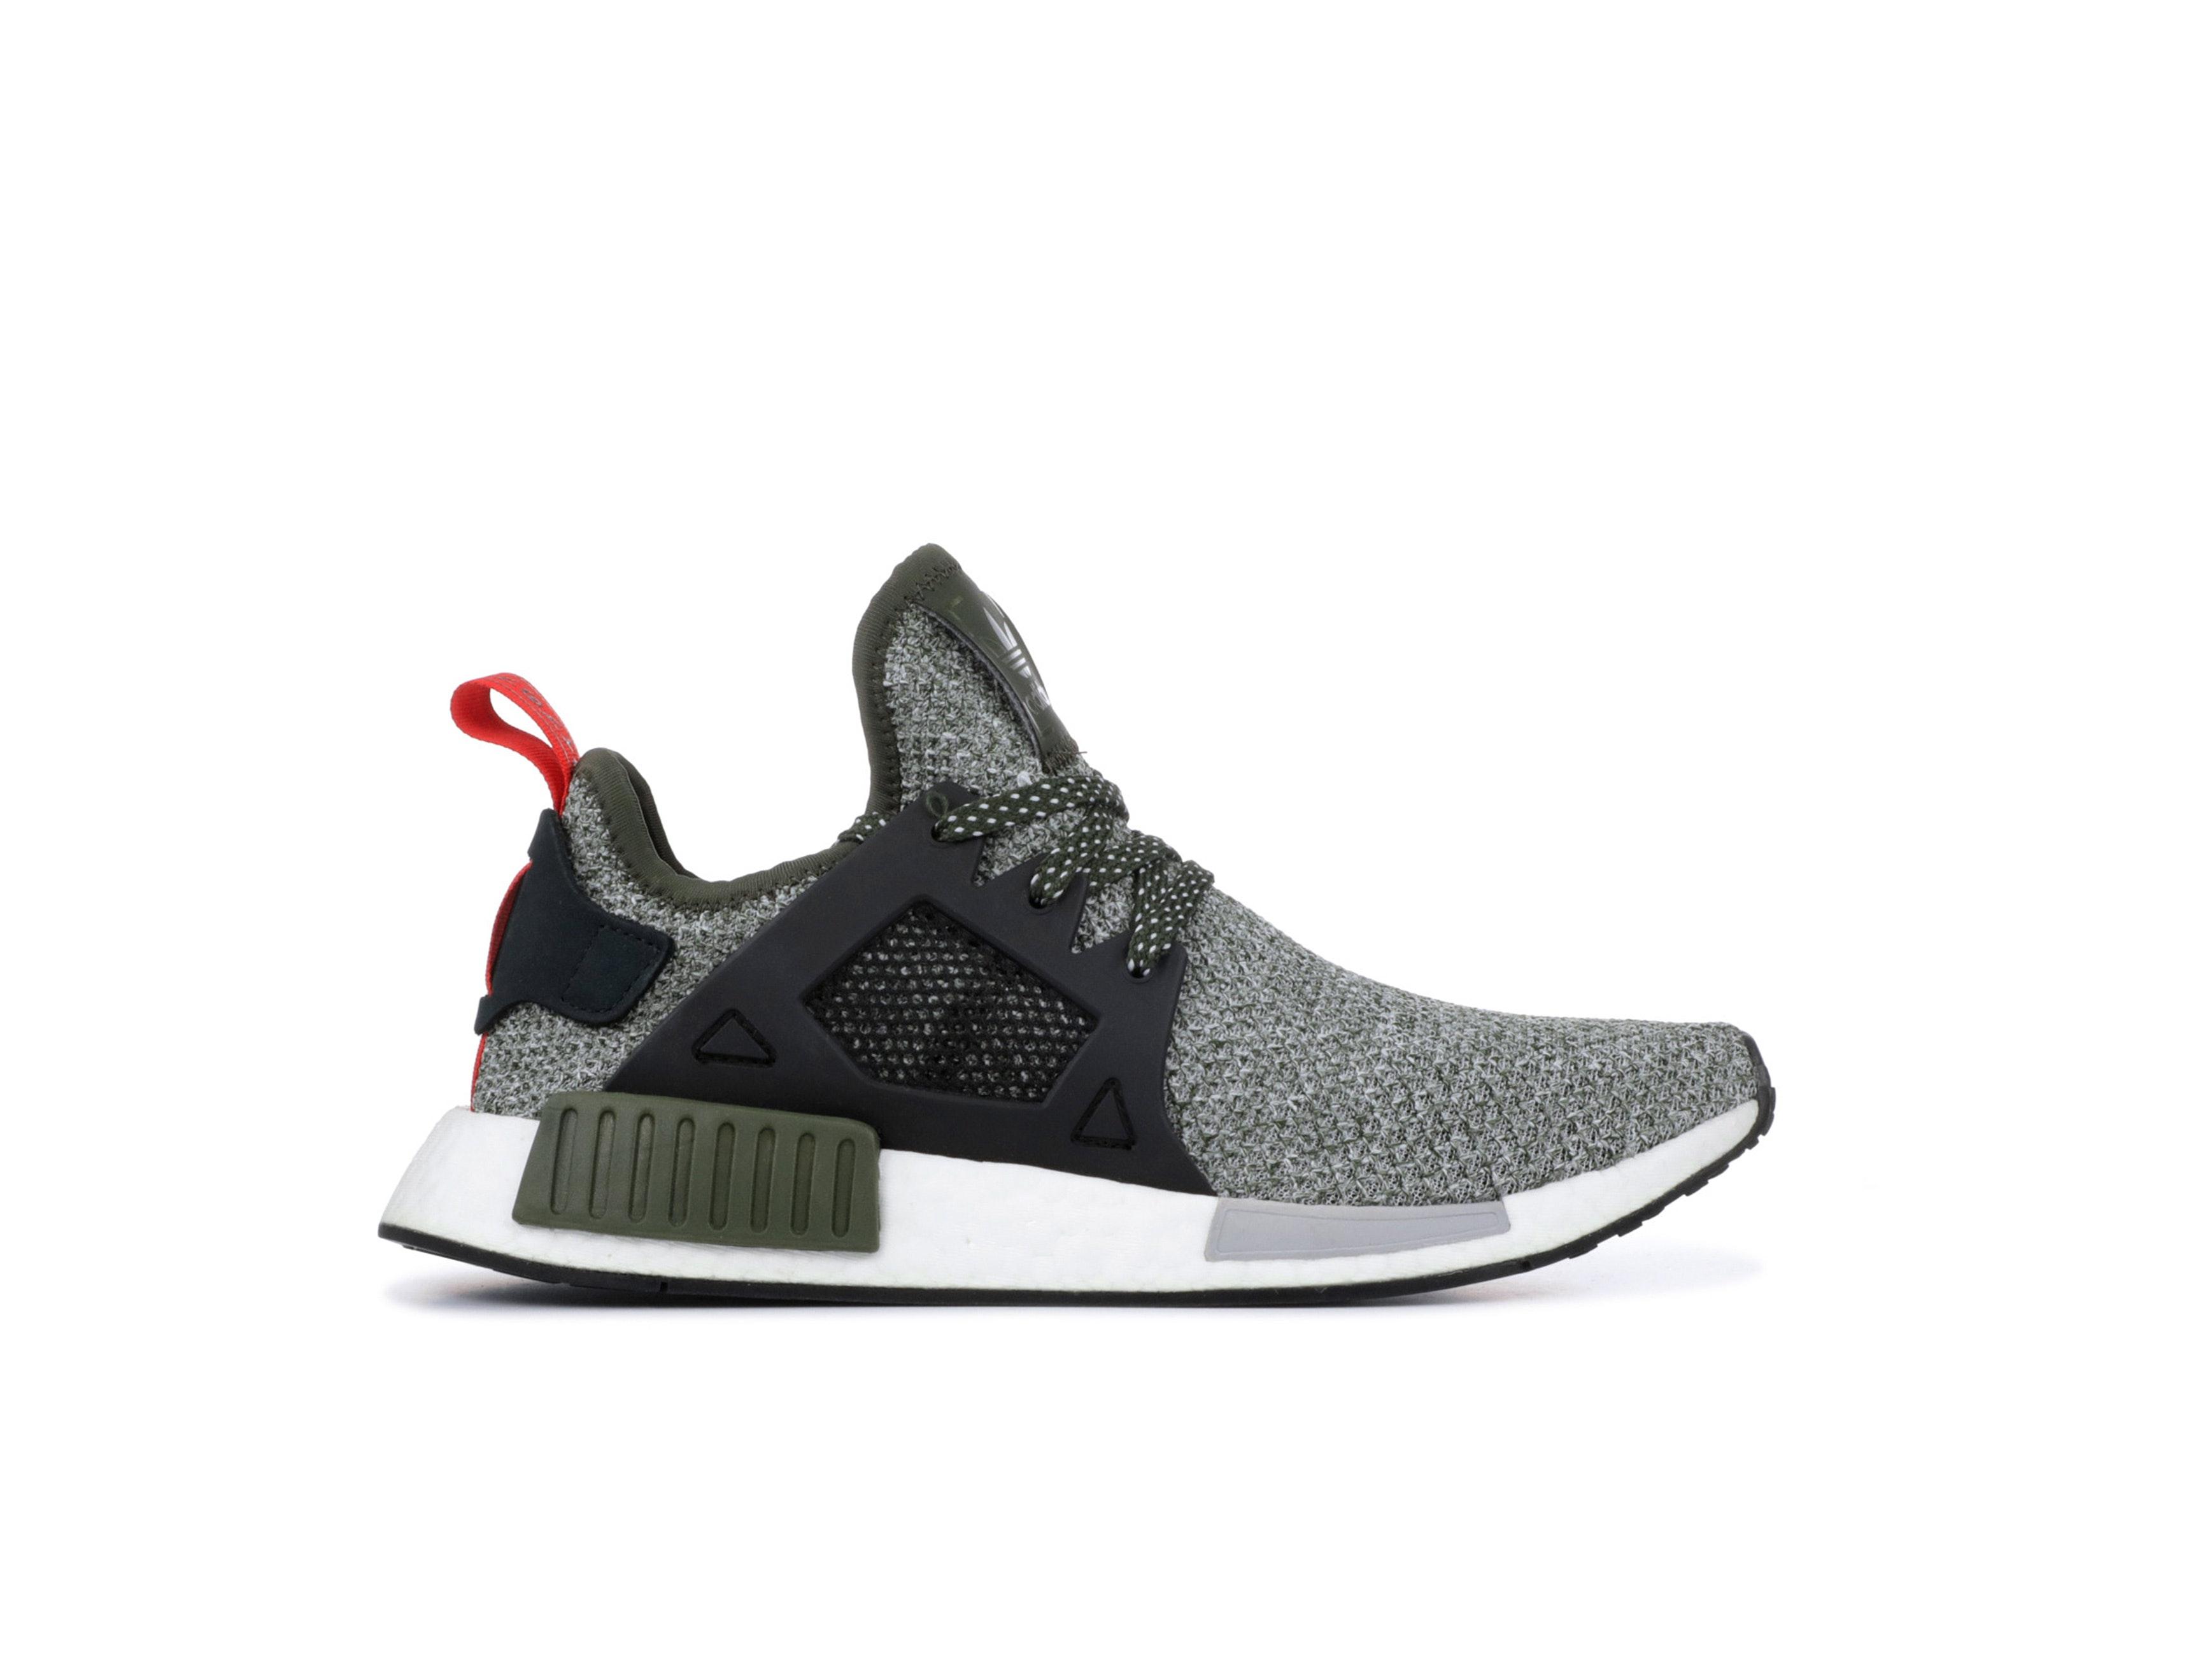 meet 9e3c2 7b4d2 Shop Black Grey NMD XR1 Online   Laced